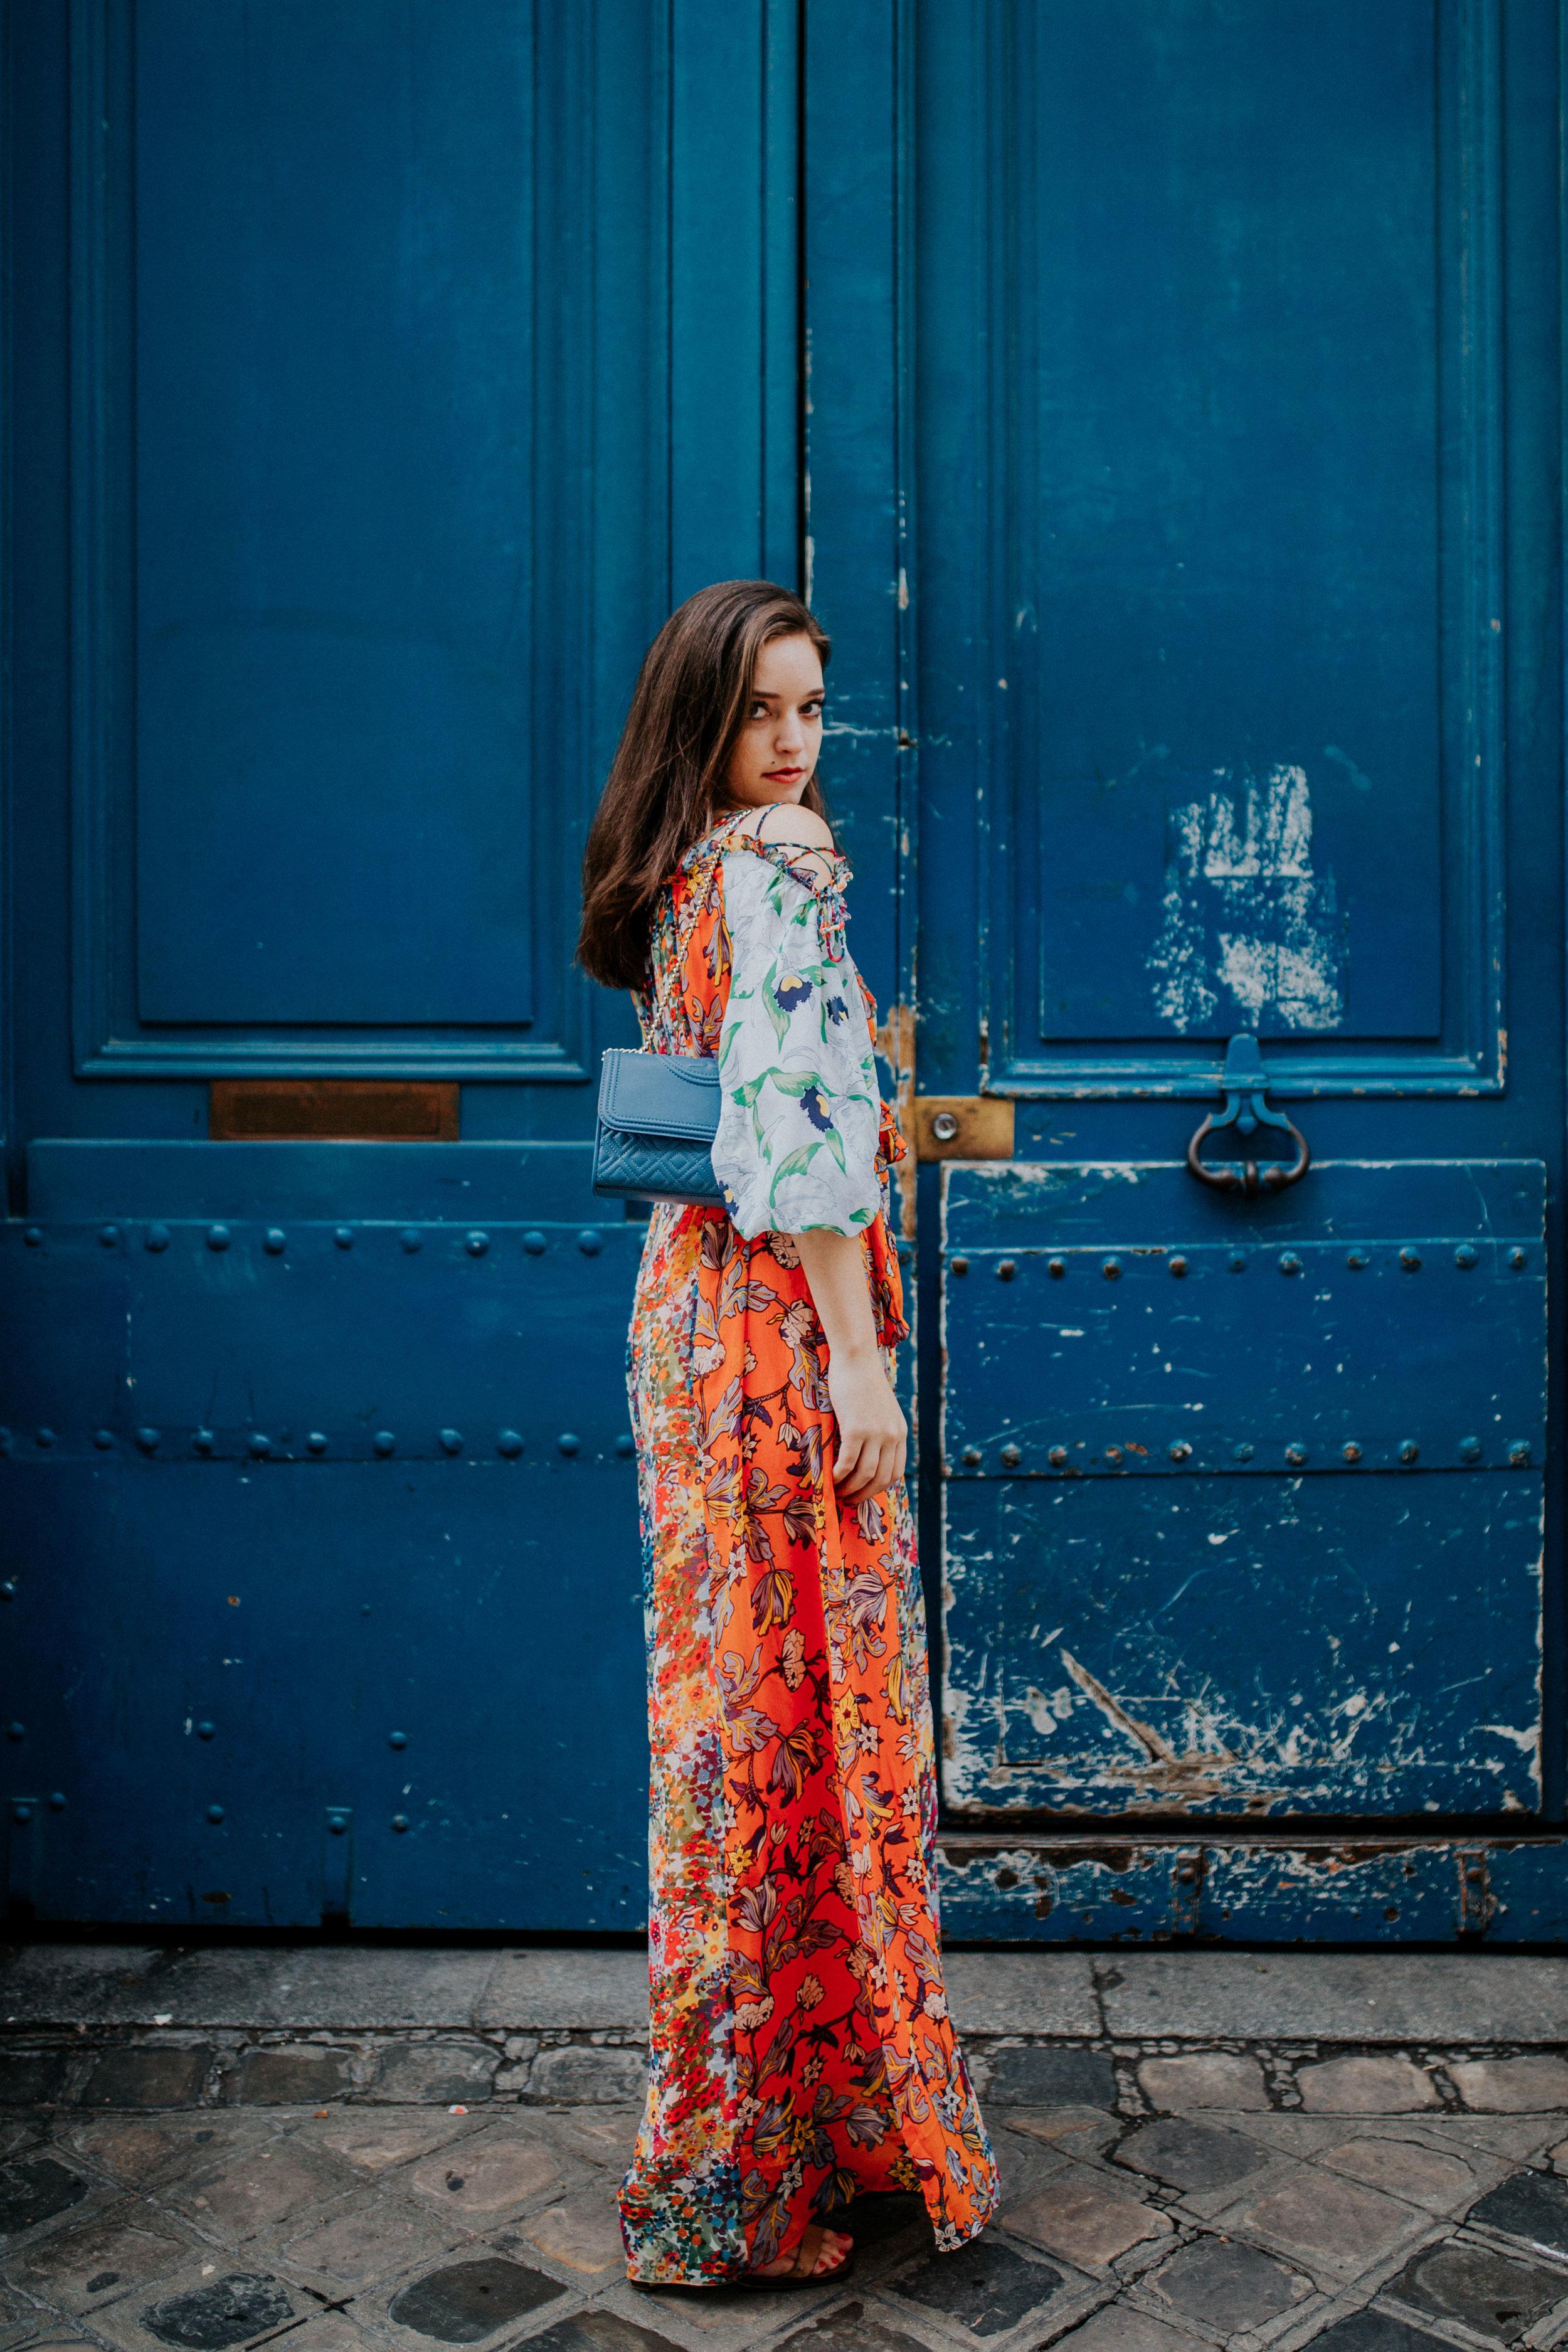 Doriana Ligorio - Look #7: Shasta Dress, Fleming Convertible Shoulder Bag